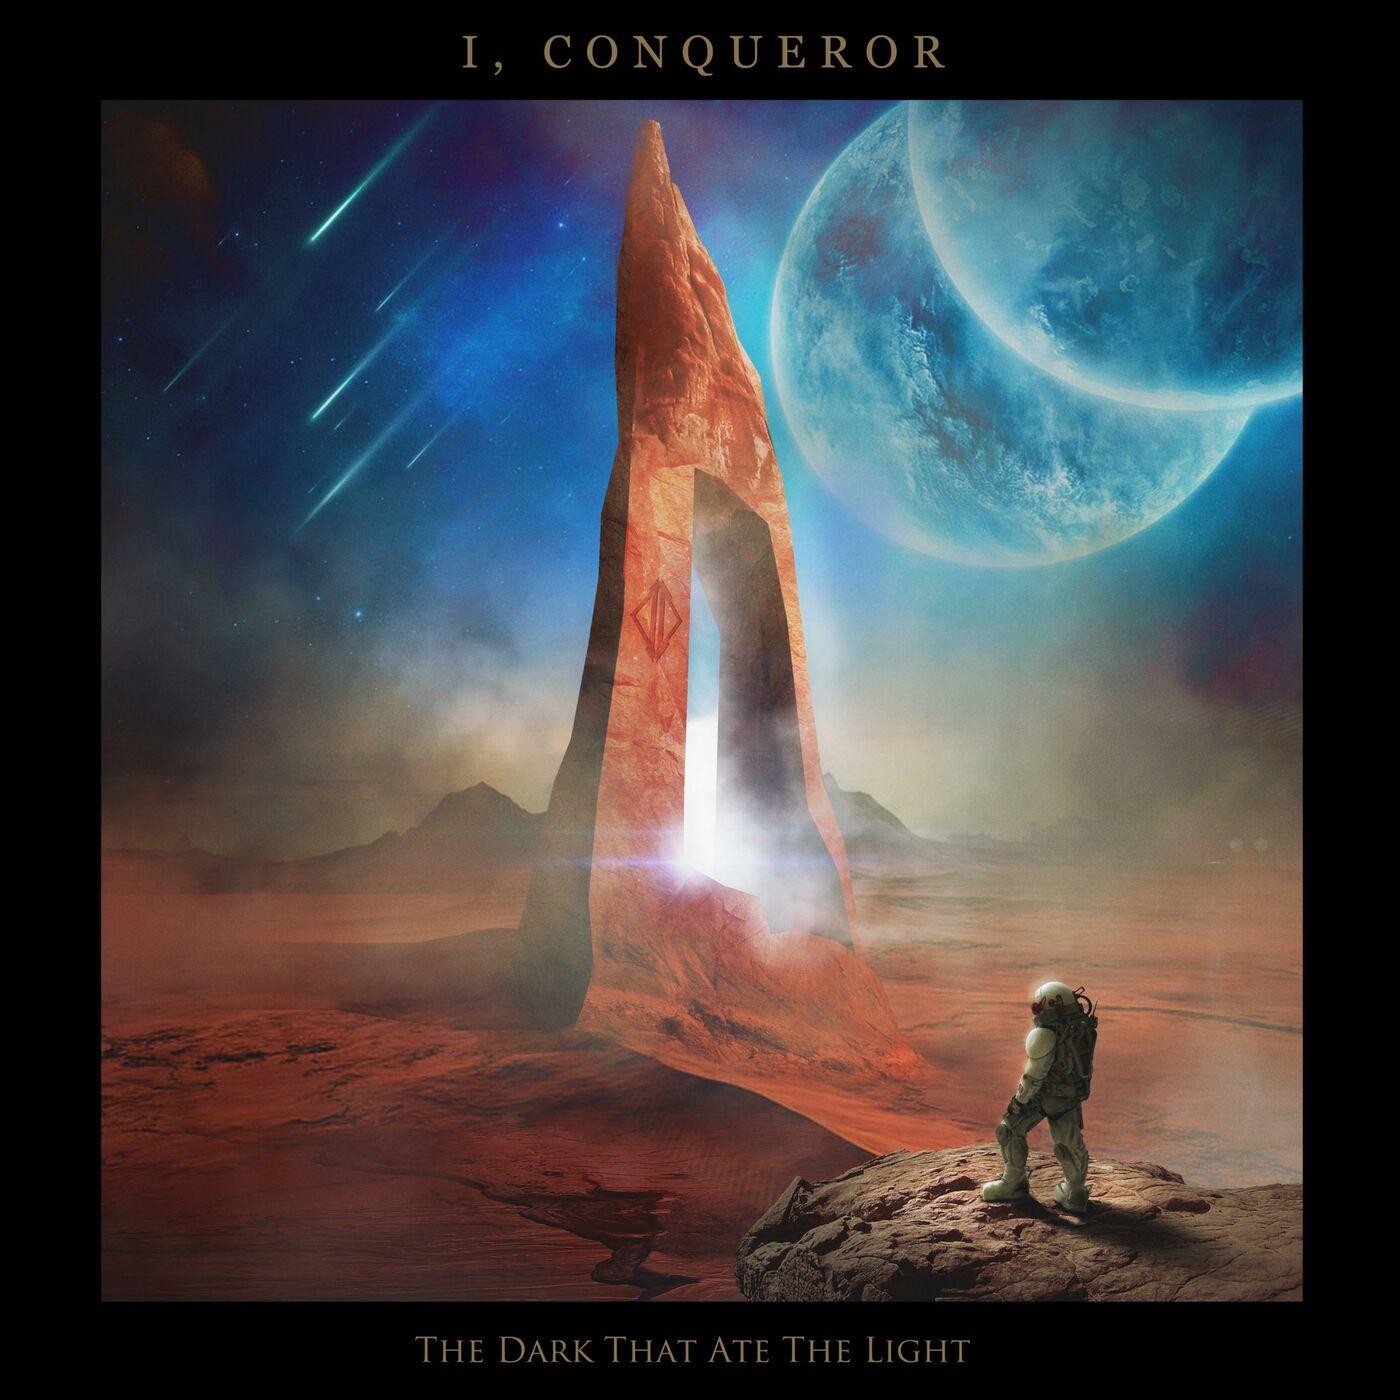 I, Conqueror - The Dark That Ate the Light (2019)